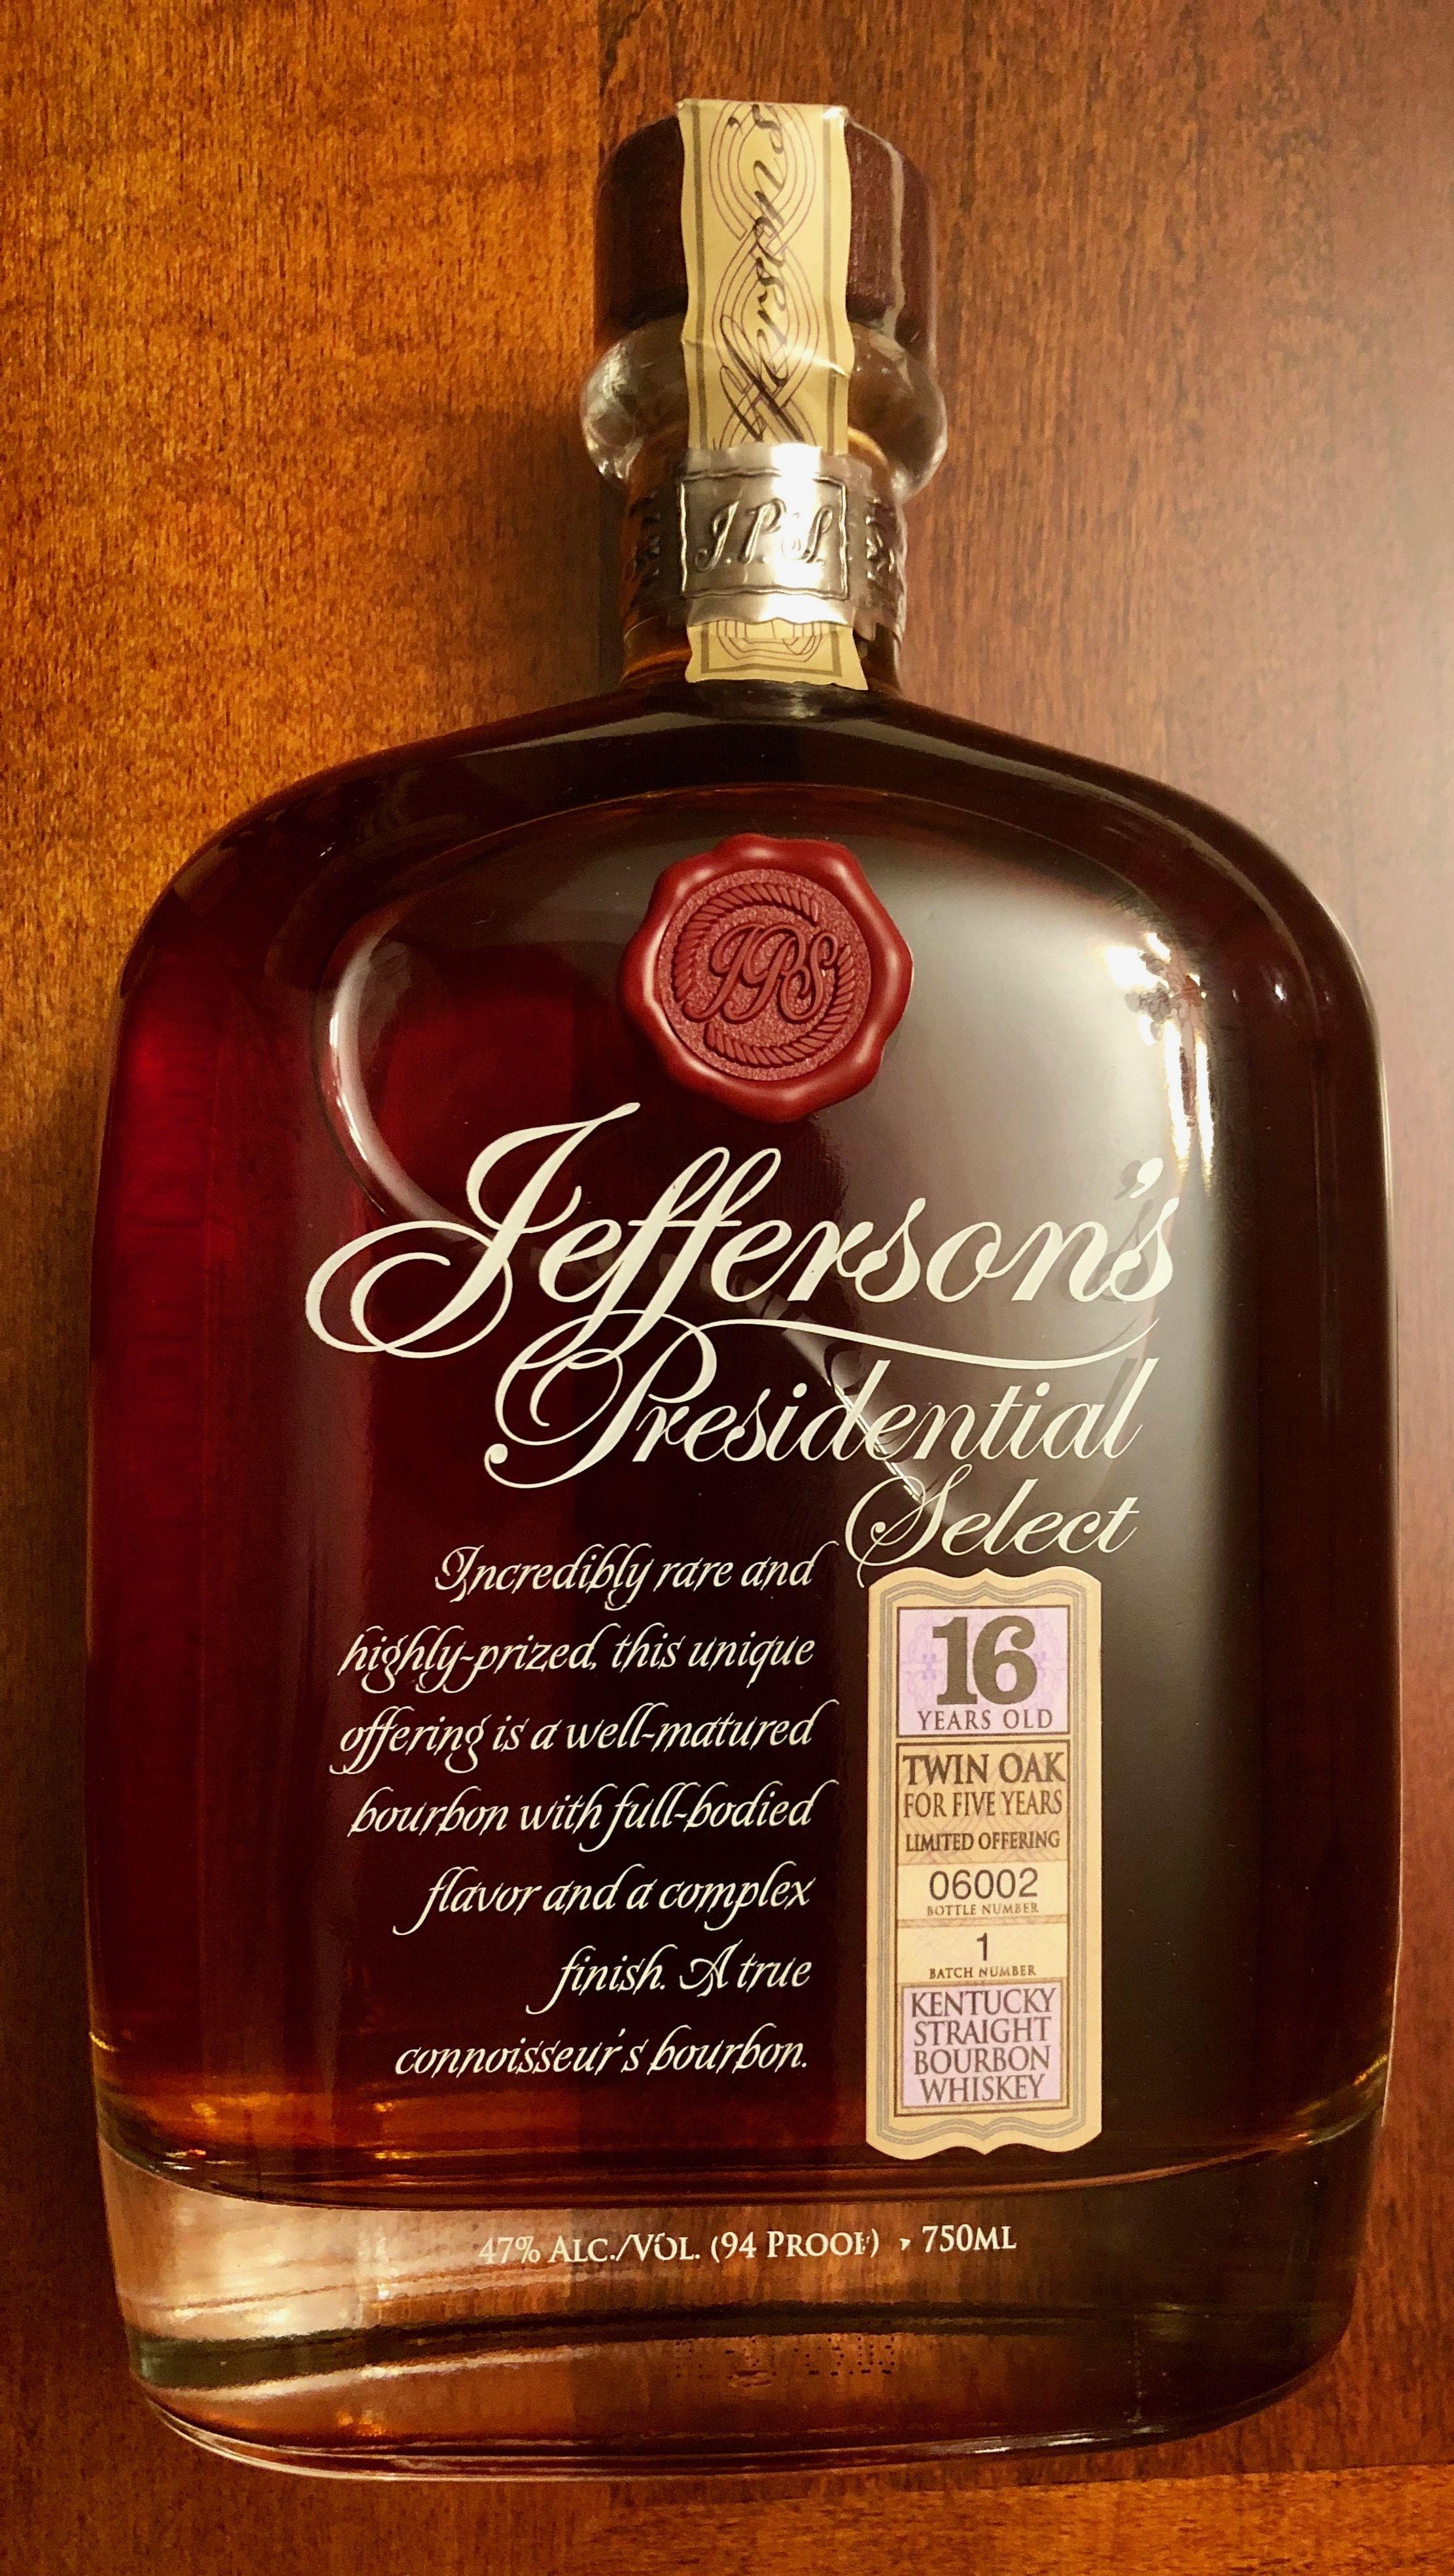 7023d025dac Jefferson s Presidential Select 16 Year Old Twin Oak Kentucky Straight  Bourbon Whiskey.  10